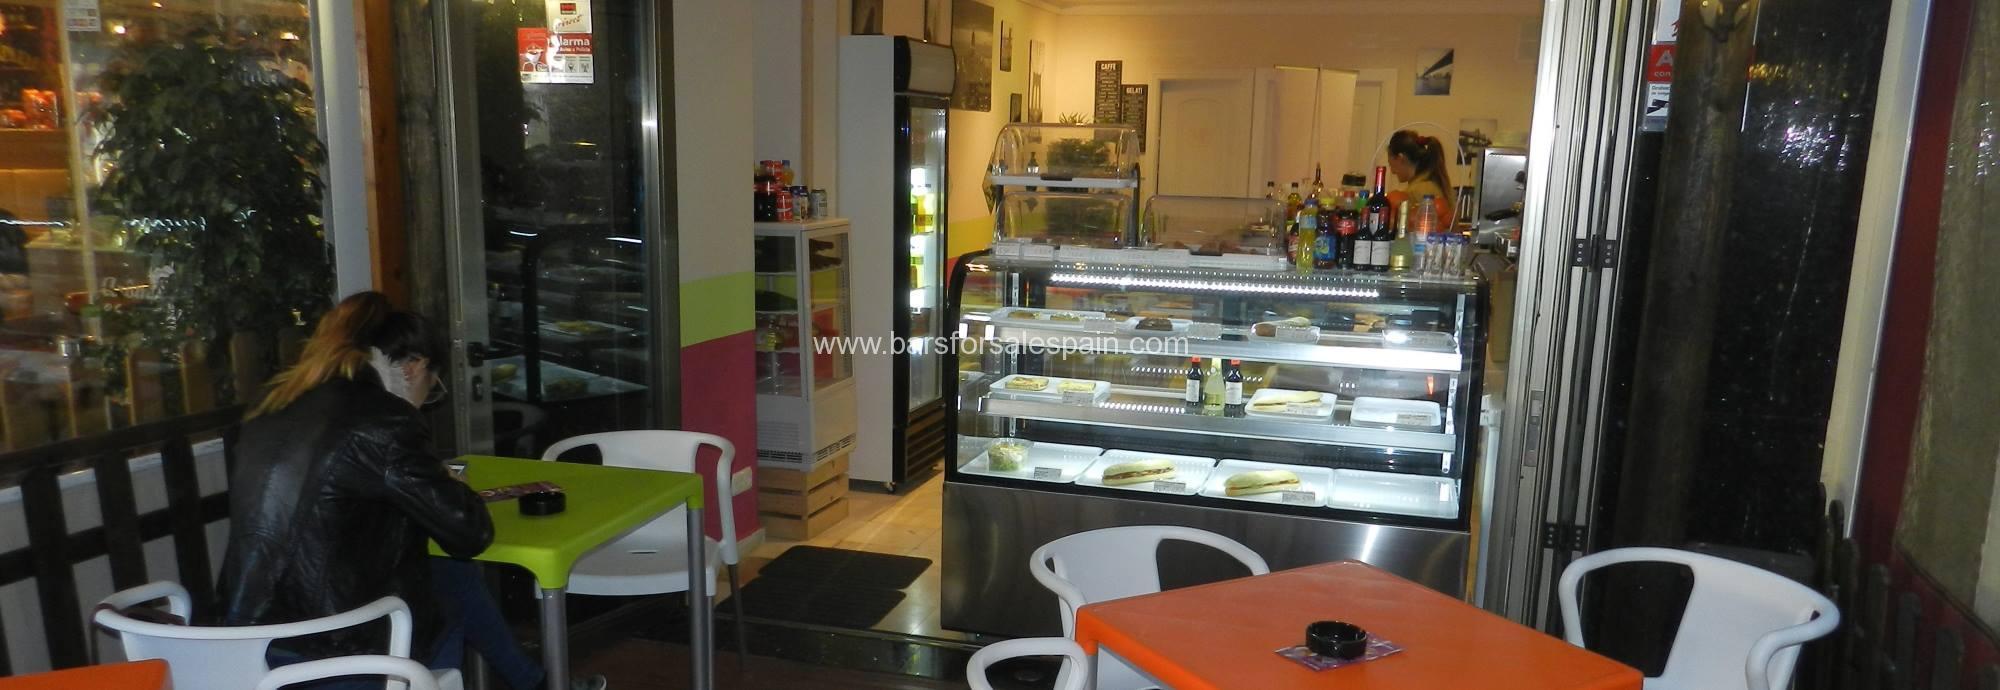 Snacks Bar For Sale in Fuengirola, Malaga, Spain